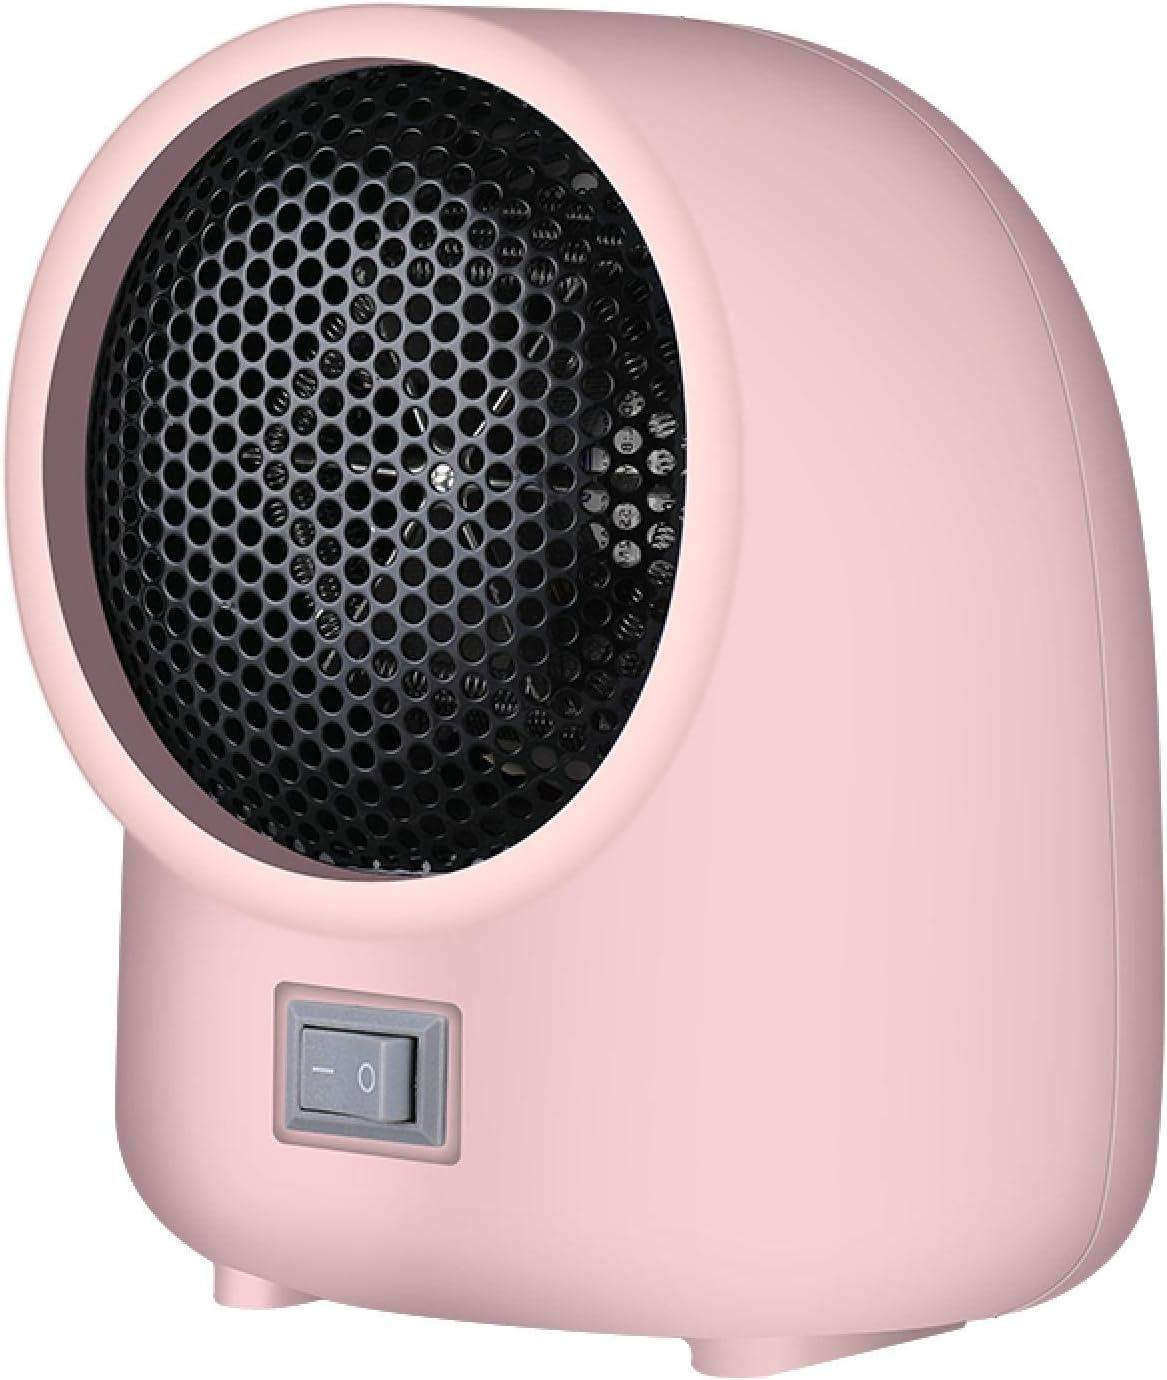 Heater Fan Portable Electric Household Indoor Heater Home Heaters Mini Desktop Air Heater Winter Heater Fan Portable Red